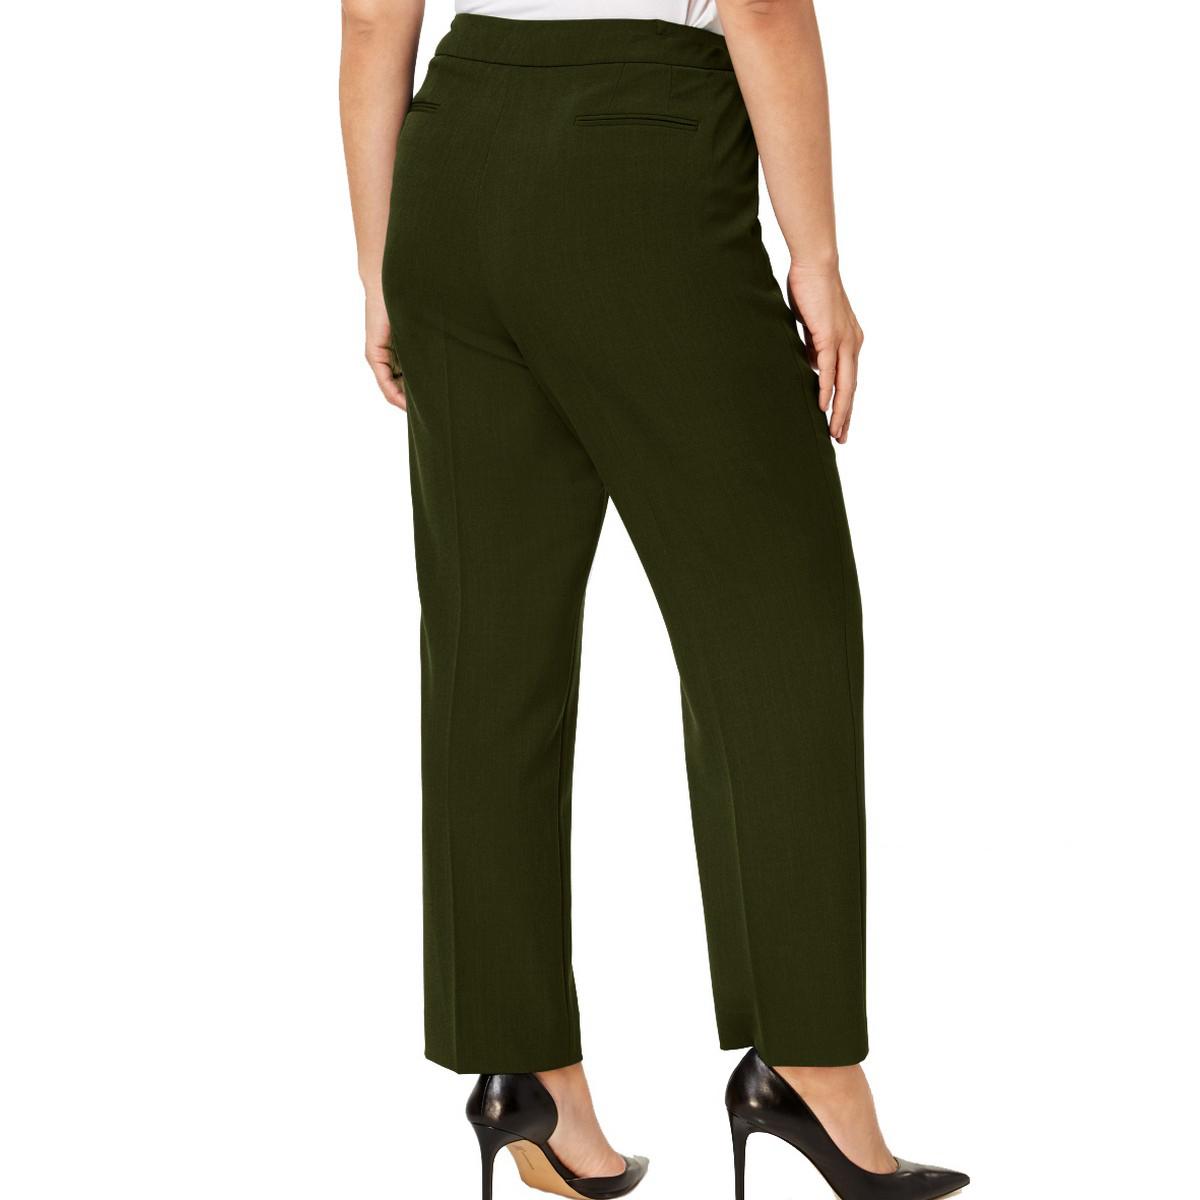 ANNE-KLEIN-NEW-Women-039-s-Plus-Size-Extended-tab-Dress-Pants-TEDO thumbnail 6